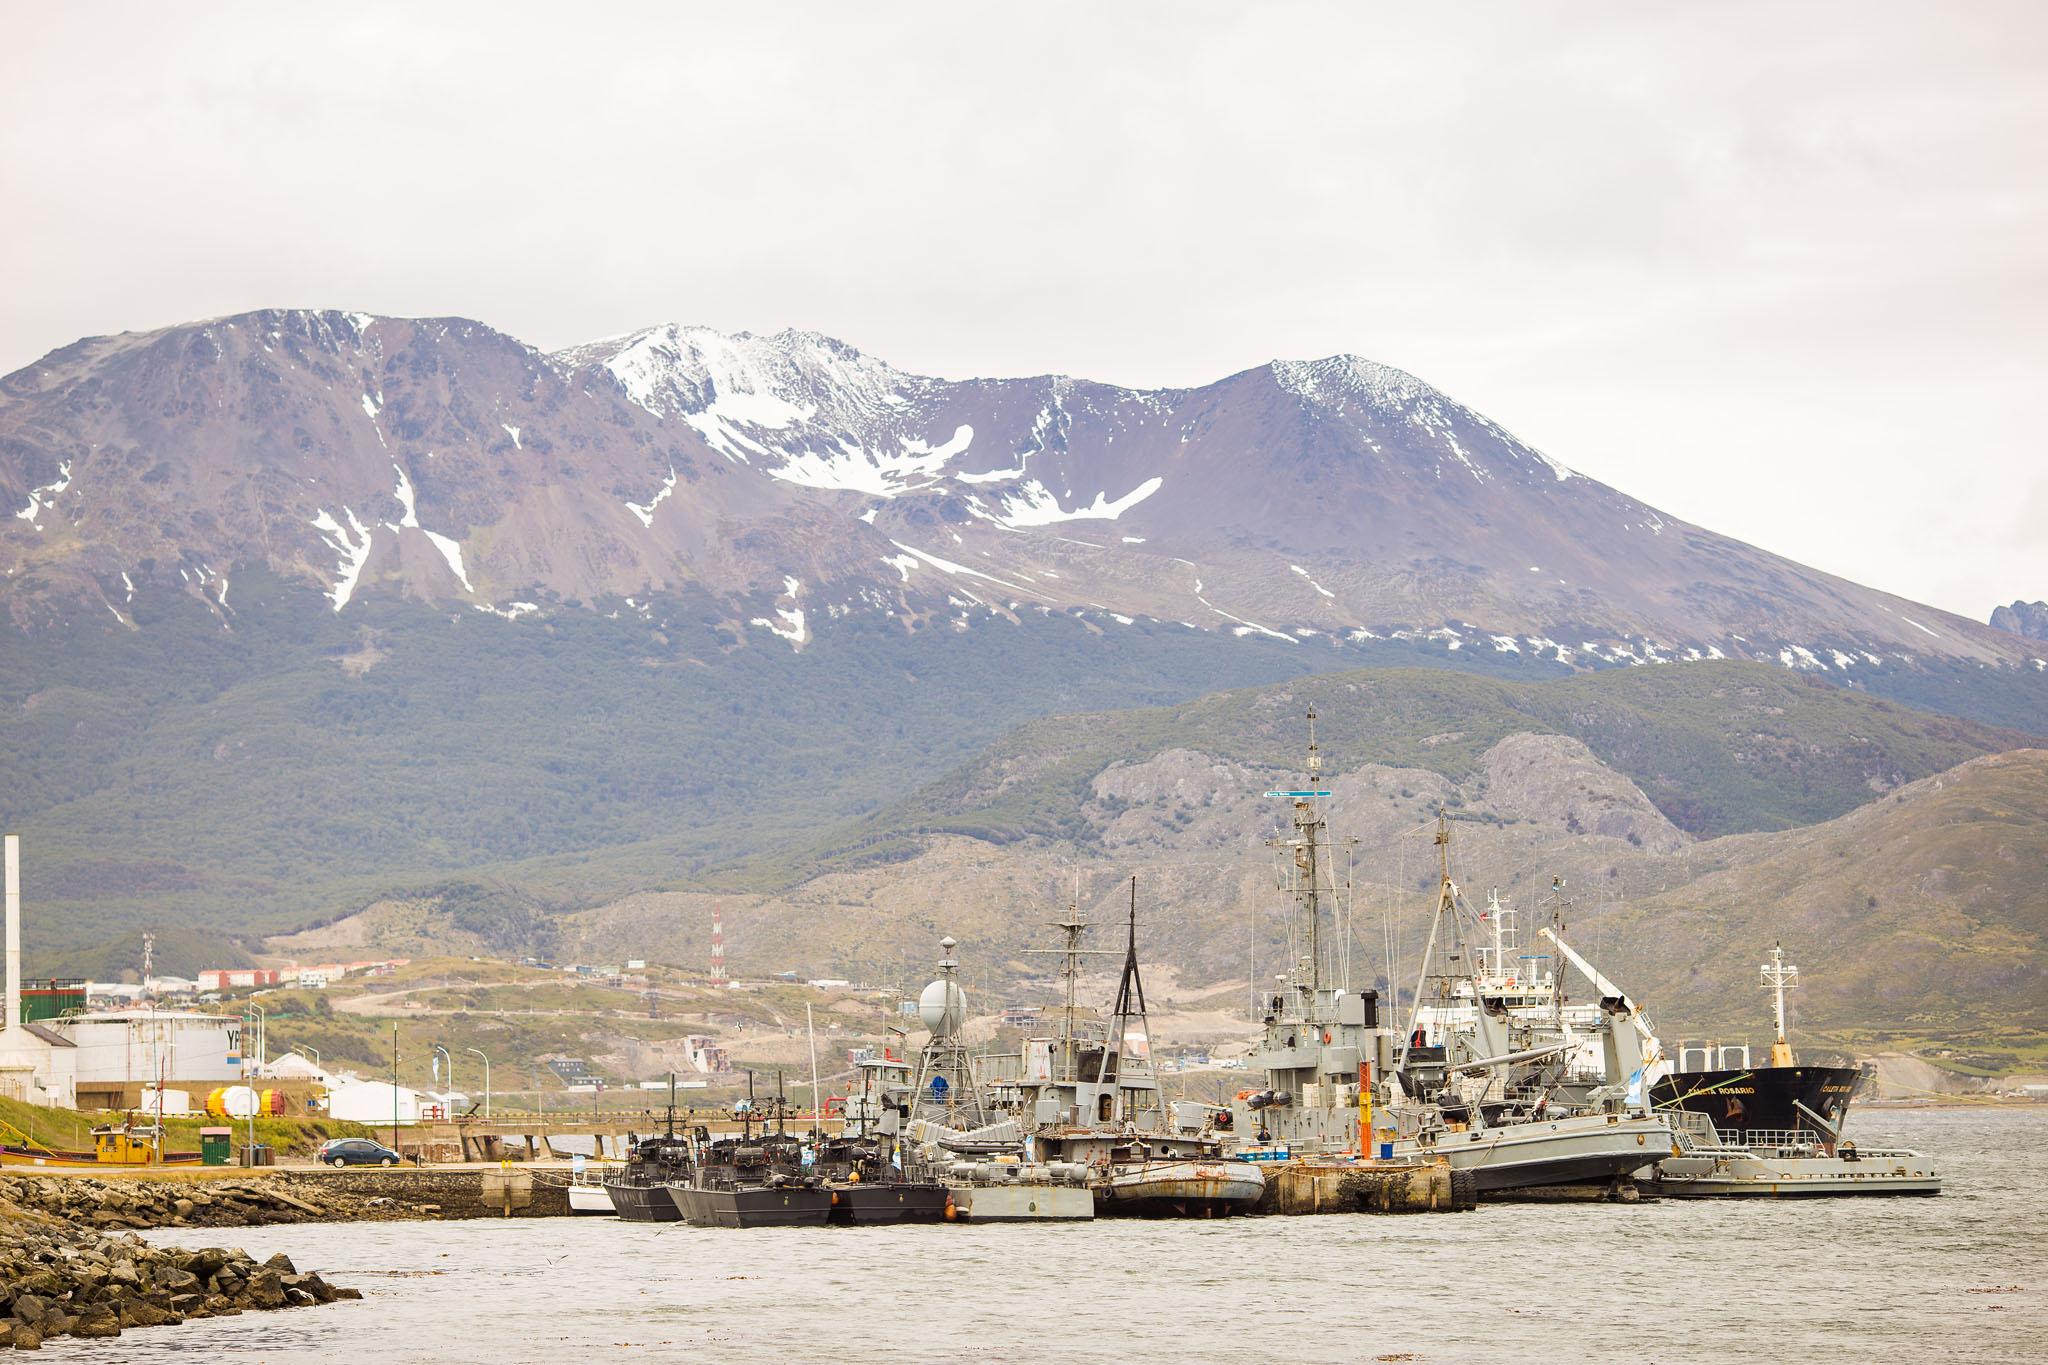 wedding-travellers-destination-wedding-argentina-fin-del-mundo-end-world-ushuaia-port-ship